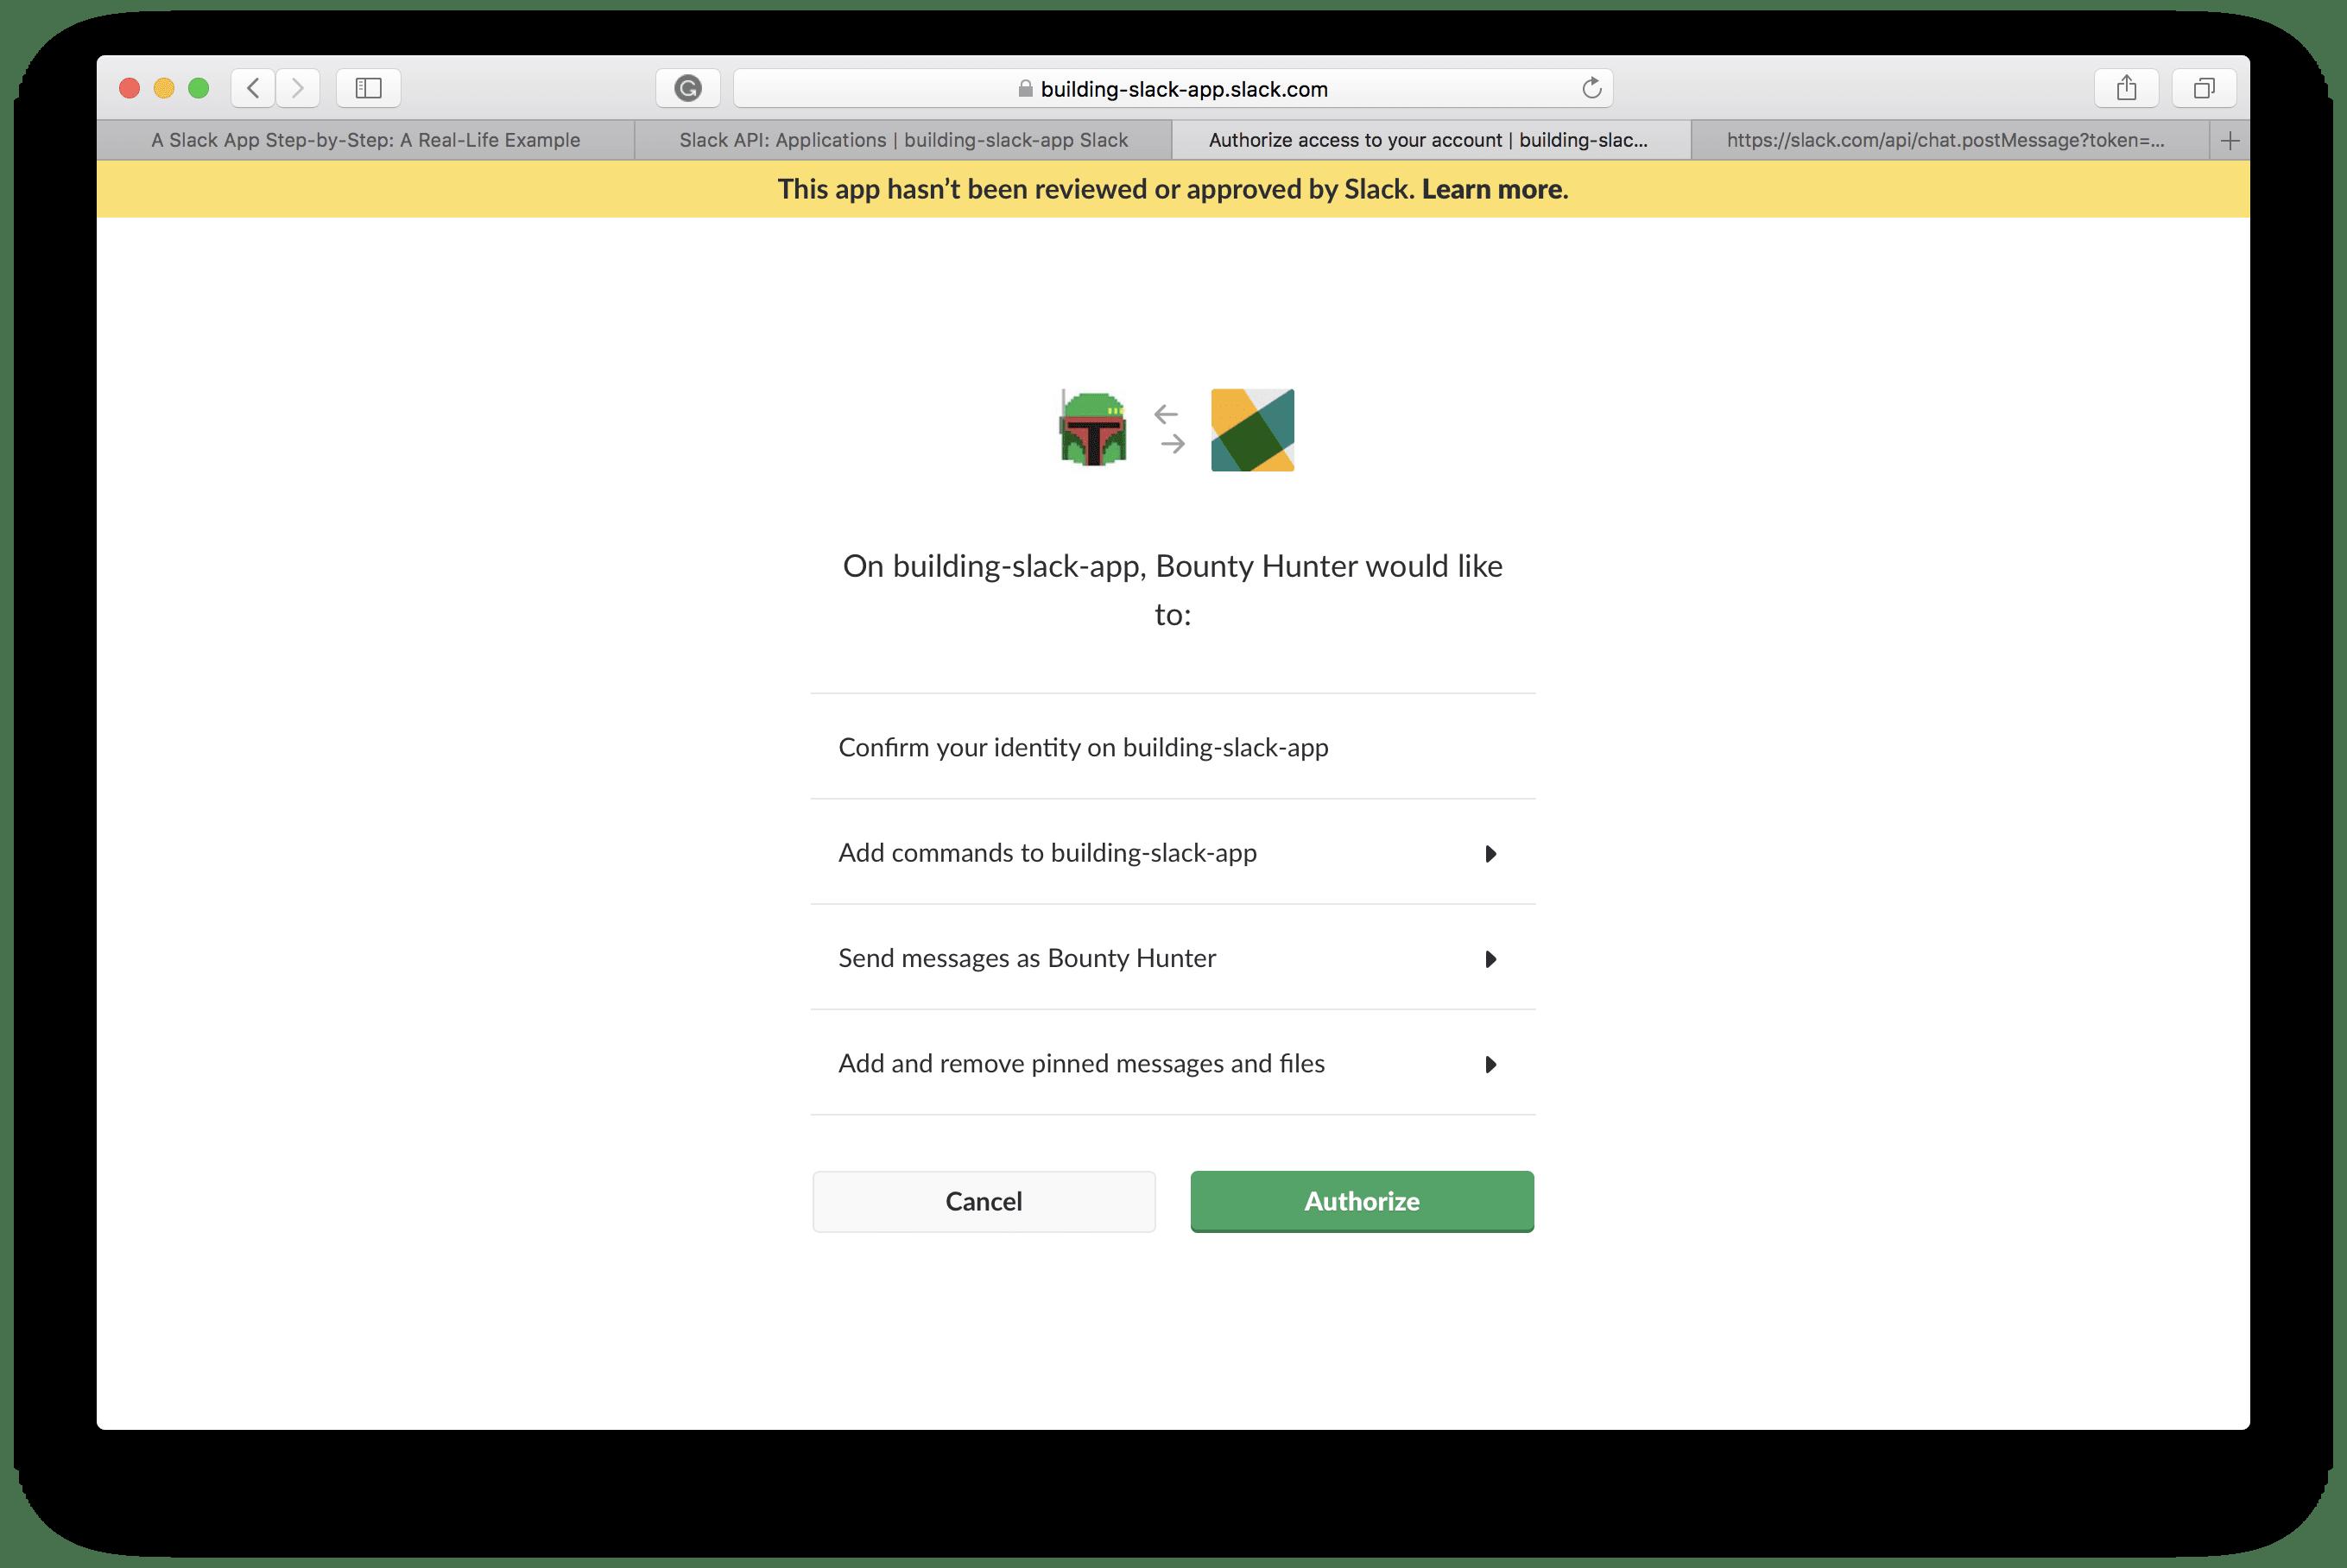 Reinstalling the app